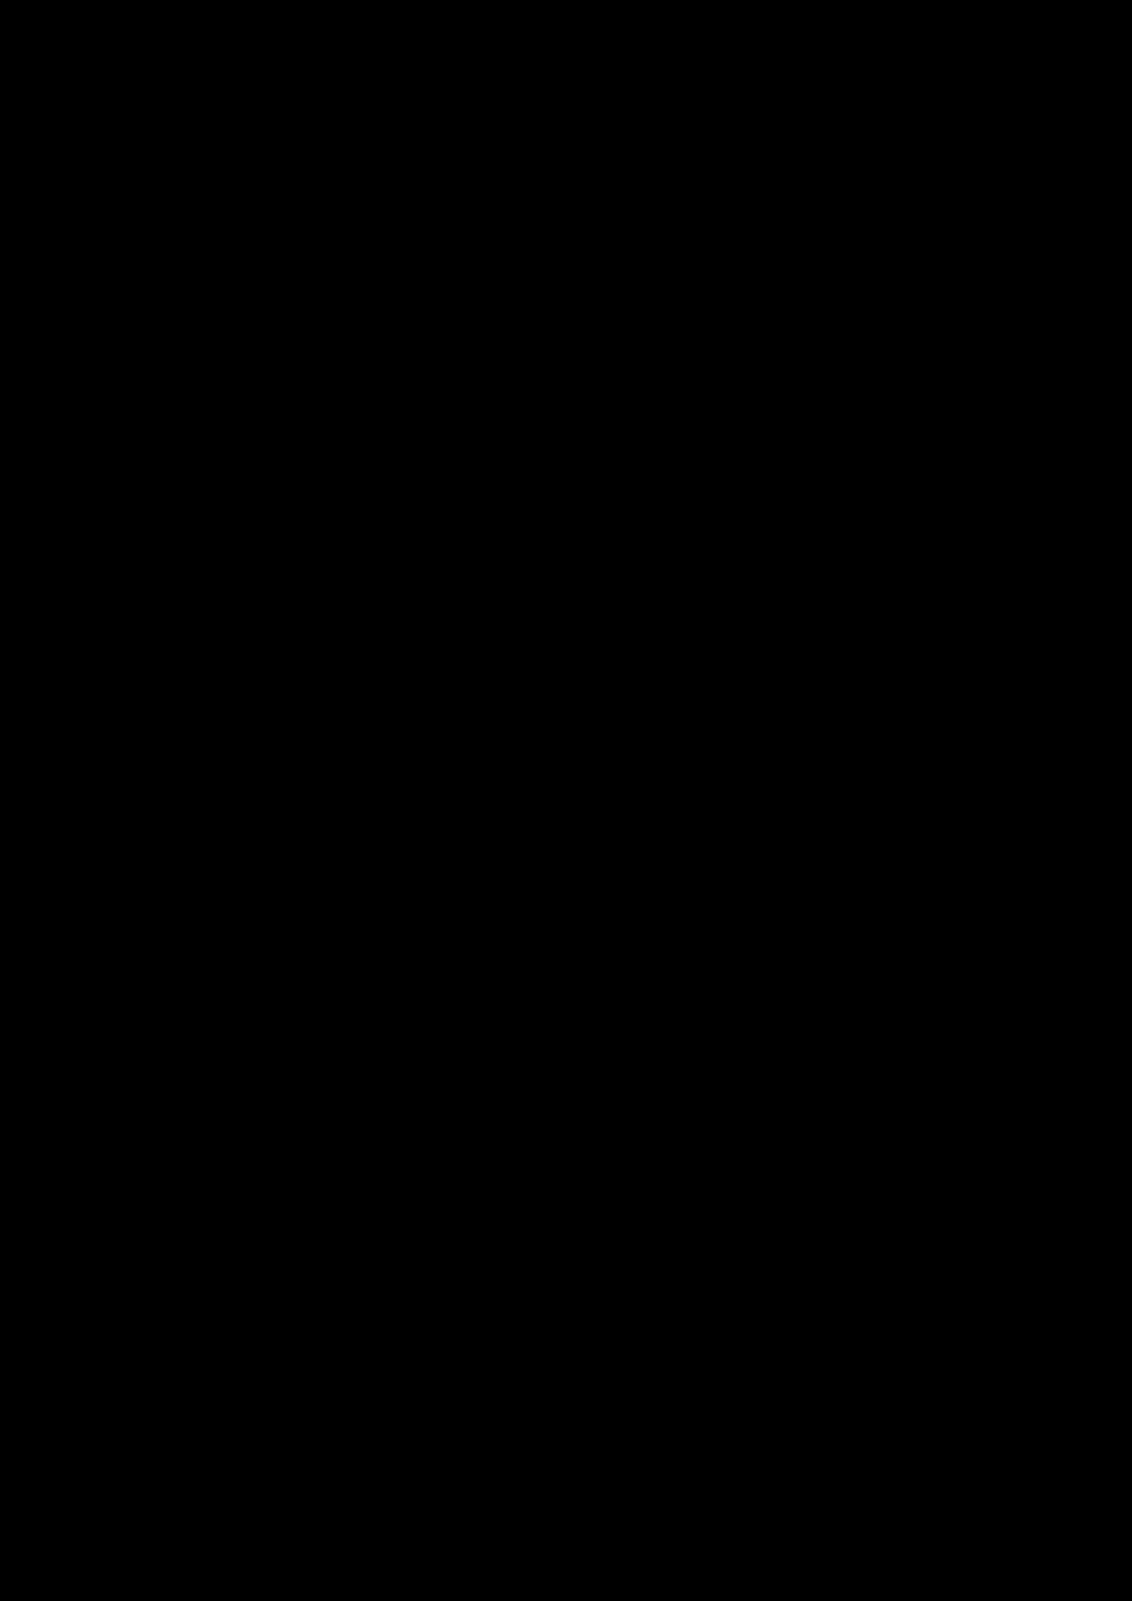 Belyiy sokol slide, Image 17